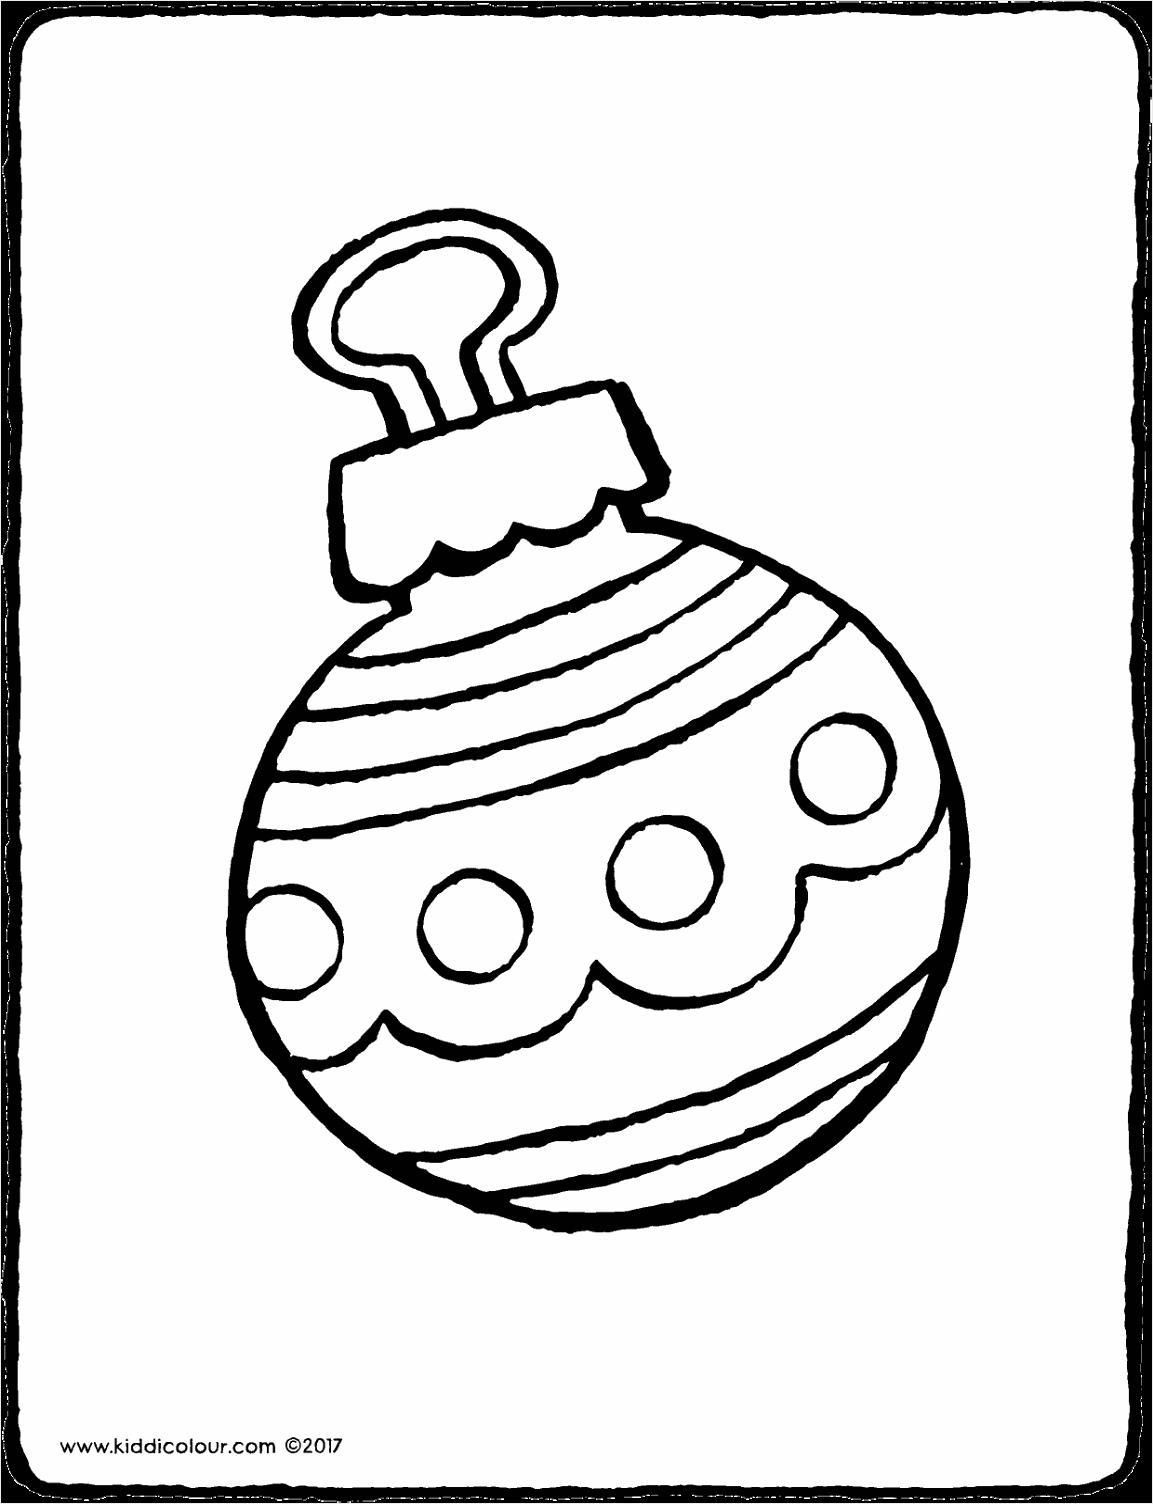 kerstbal kleurplaat kleurprent tekening 01V oituy